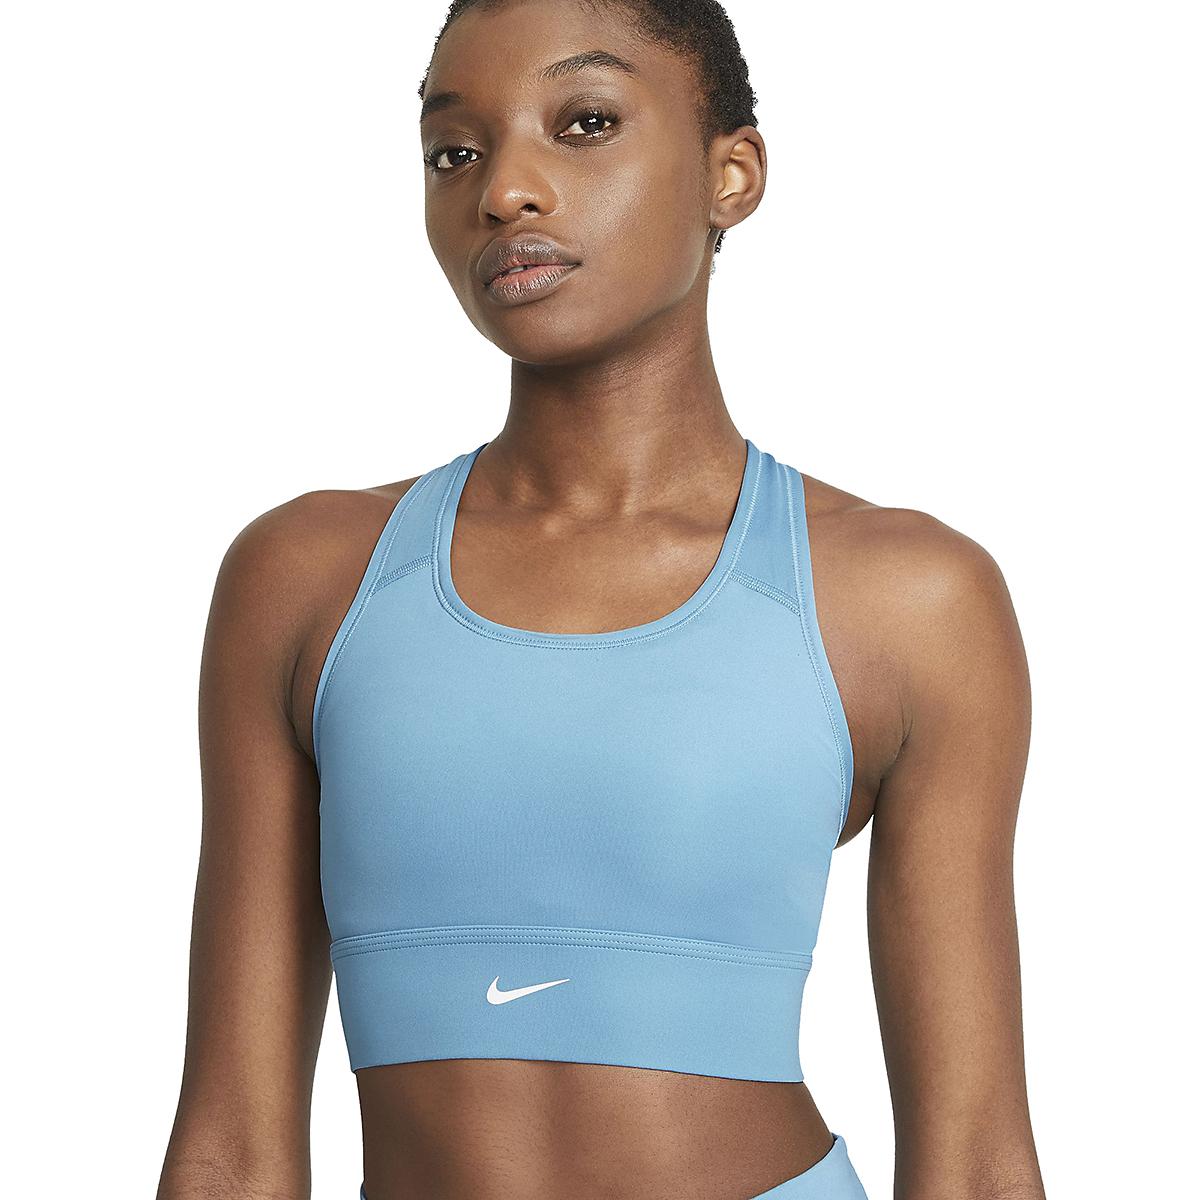 Women's Nike Swoosh Long Line Bra - Color: Cerulean/White - Size: XS, Cerulean/White, large, image 3